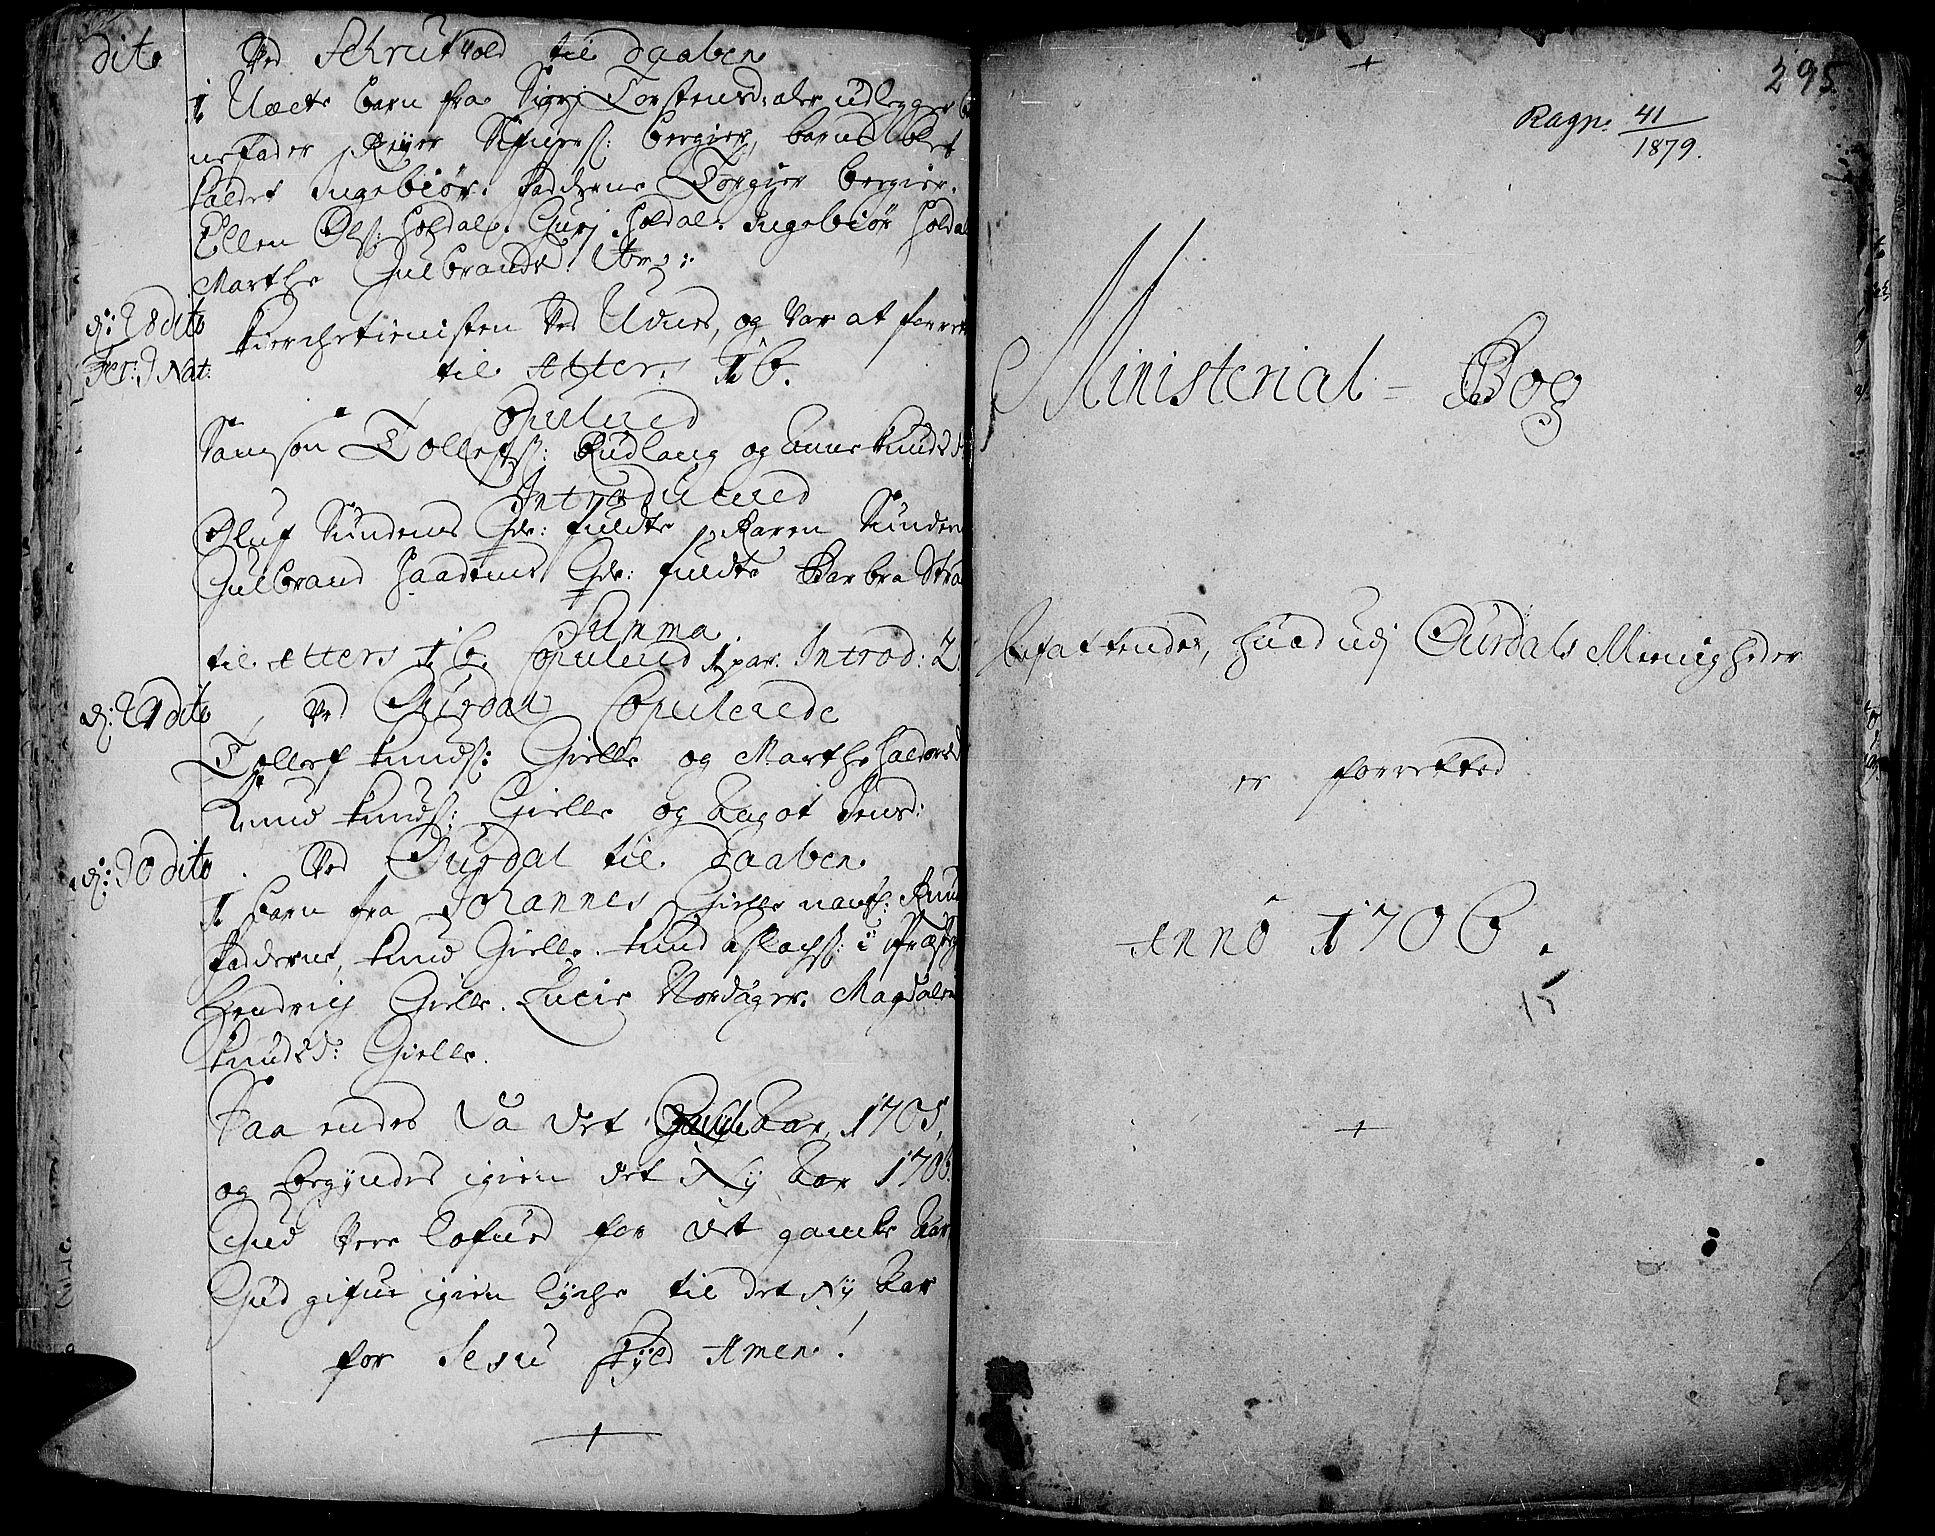 SAH, Aurdal prestekontor, Ministerialbok nr. 1-3, 1692-1730, s. 295